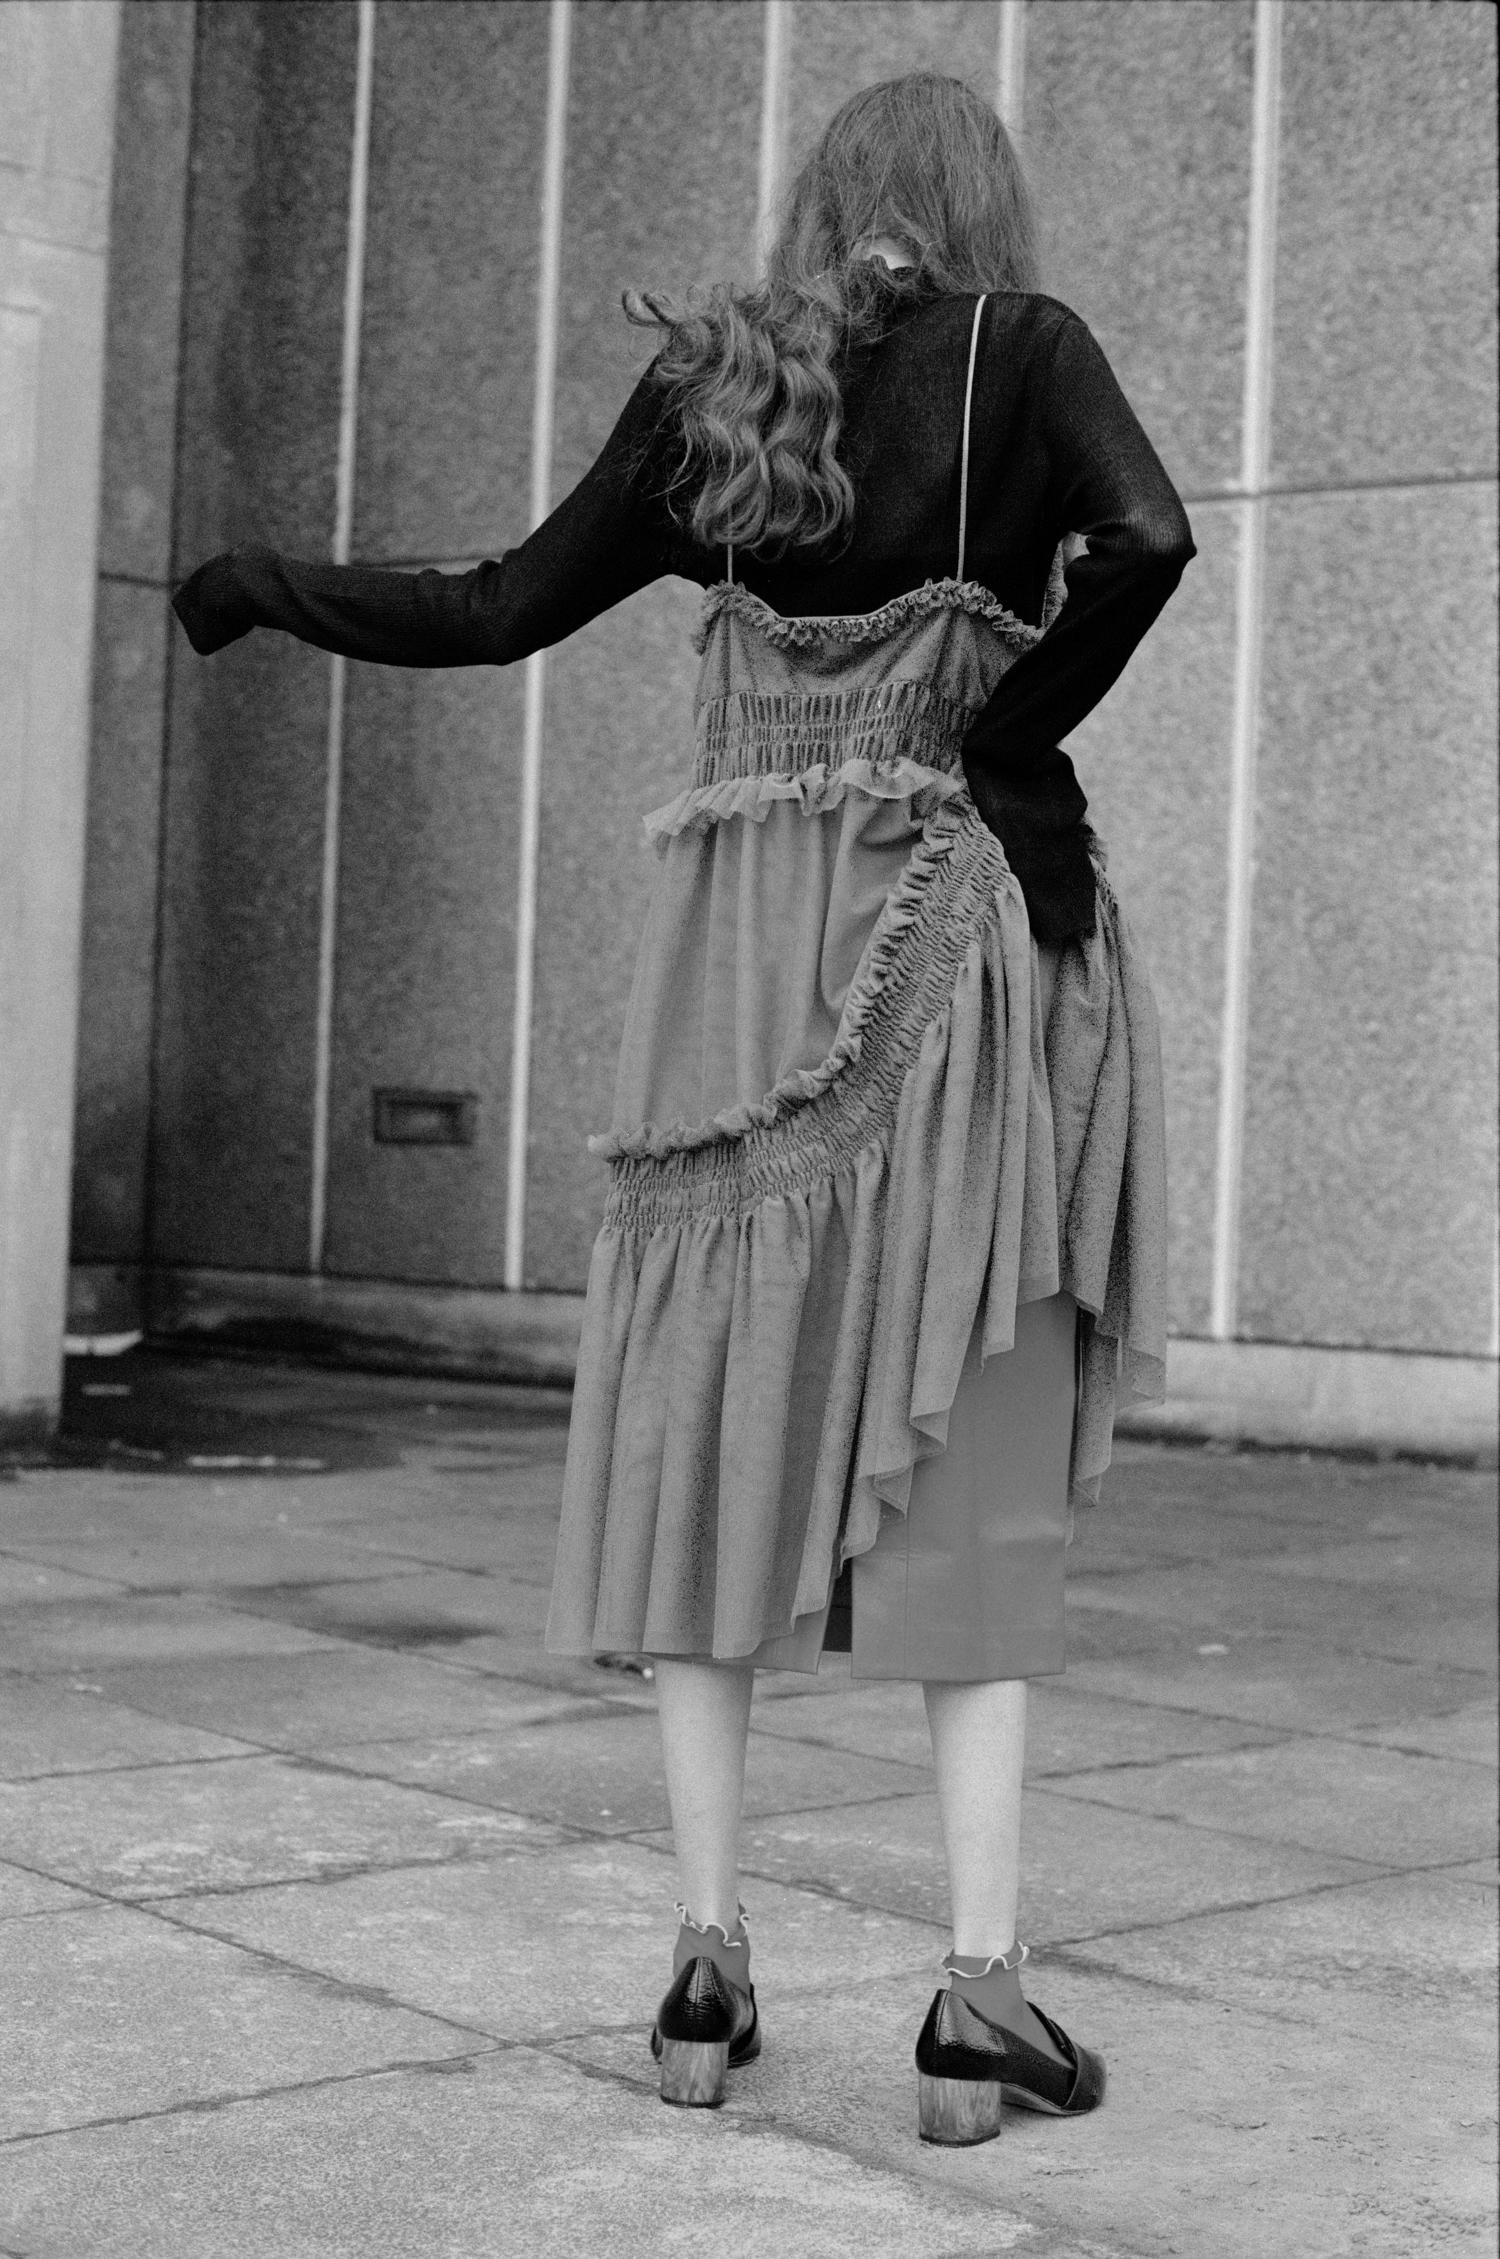 turtleneck COS, dress H&M, skirt ZARA